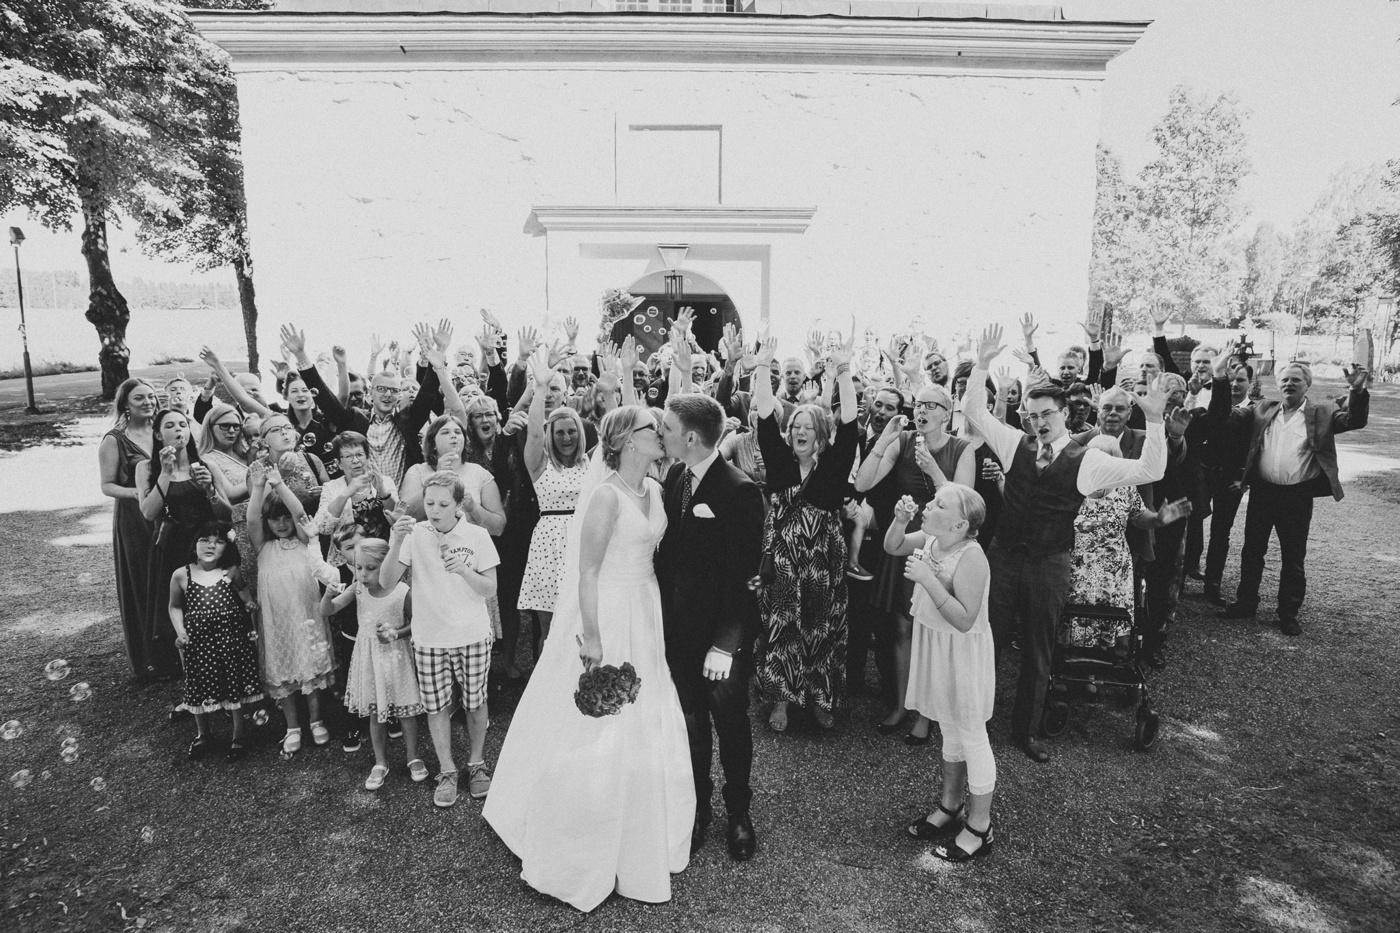 ceciliajoakim_sweden-countryside-summer-wedding_melbourne-fun-quirky-wedding-photography_24